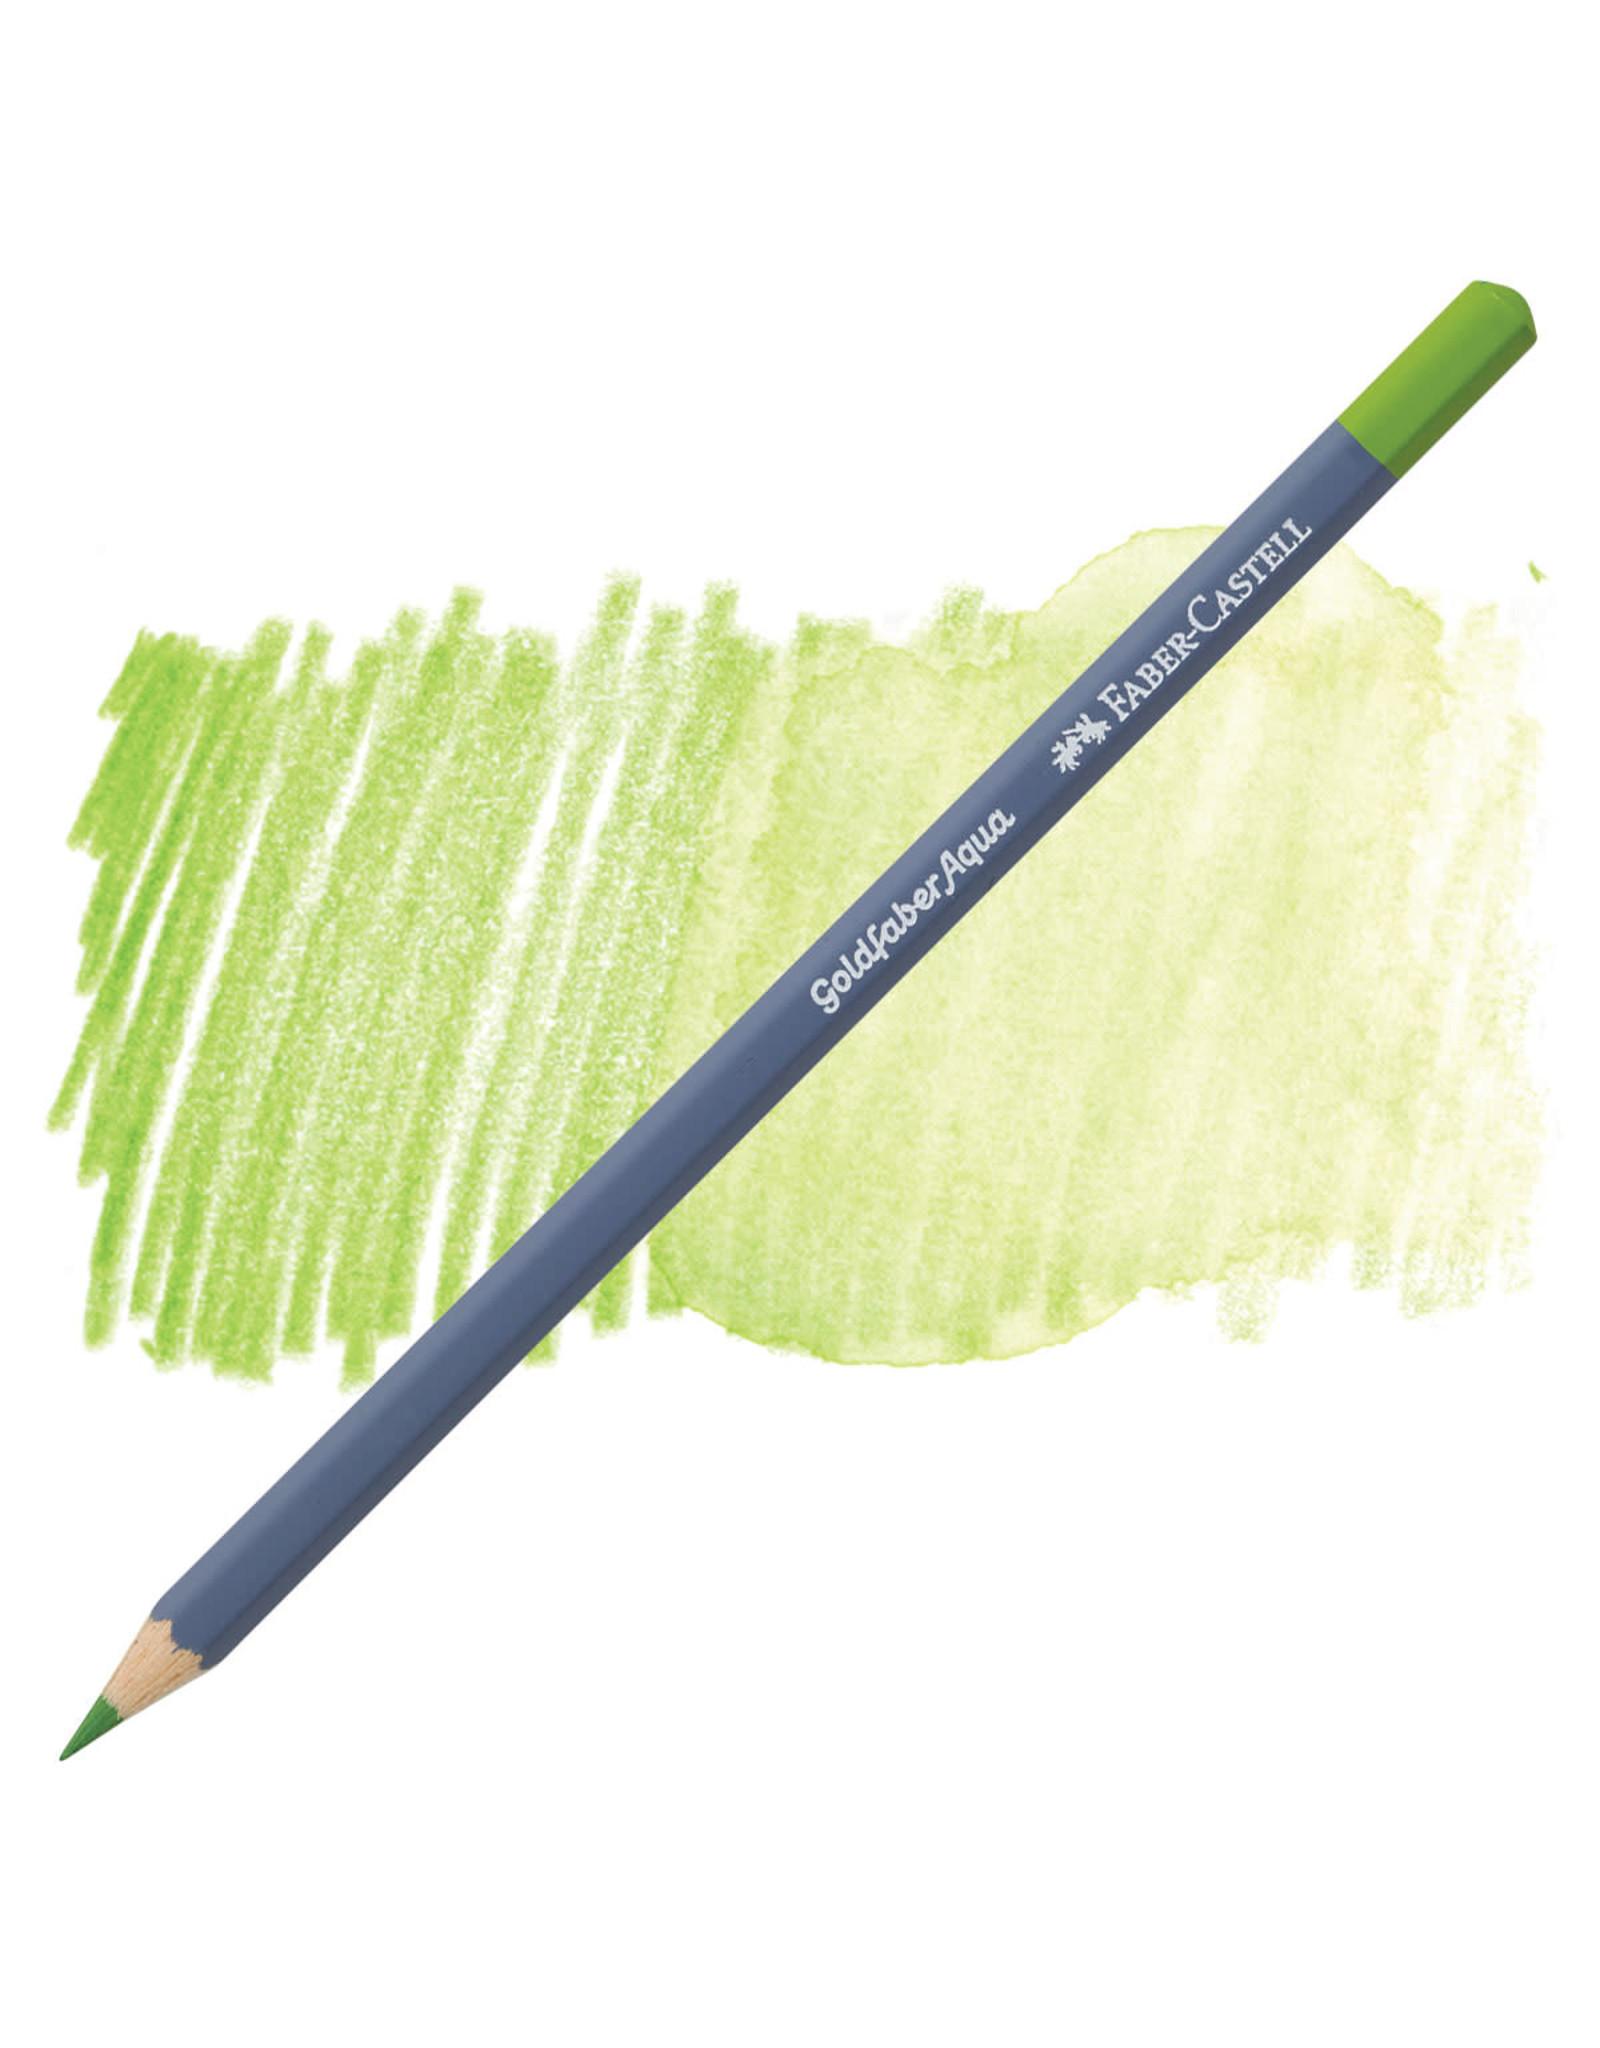 Faber-Castell Goldfaber Aqua Watercolor Pencil - May Green #170